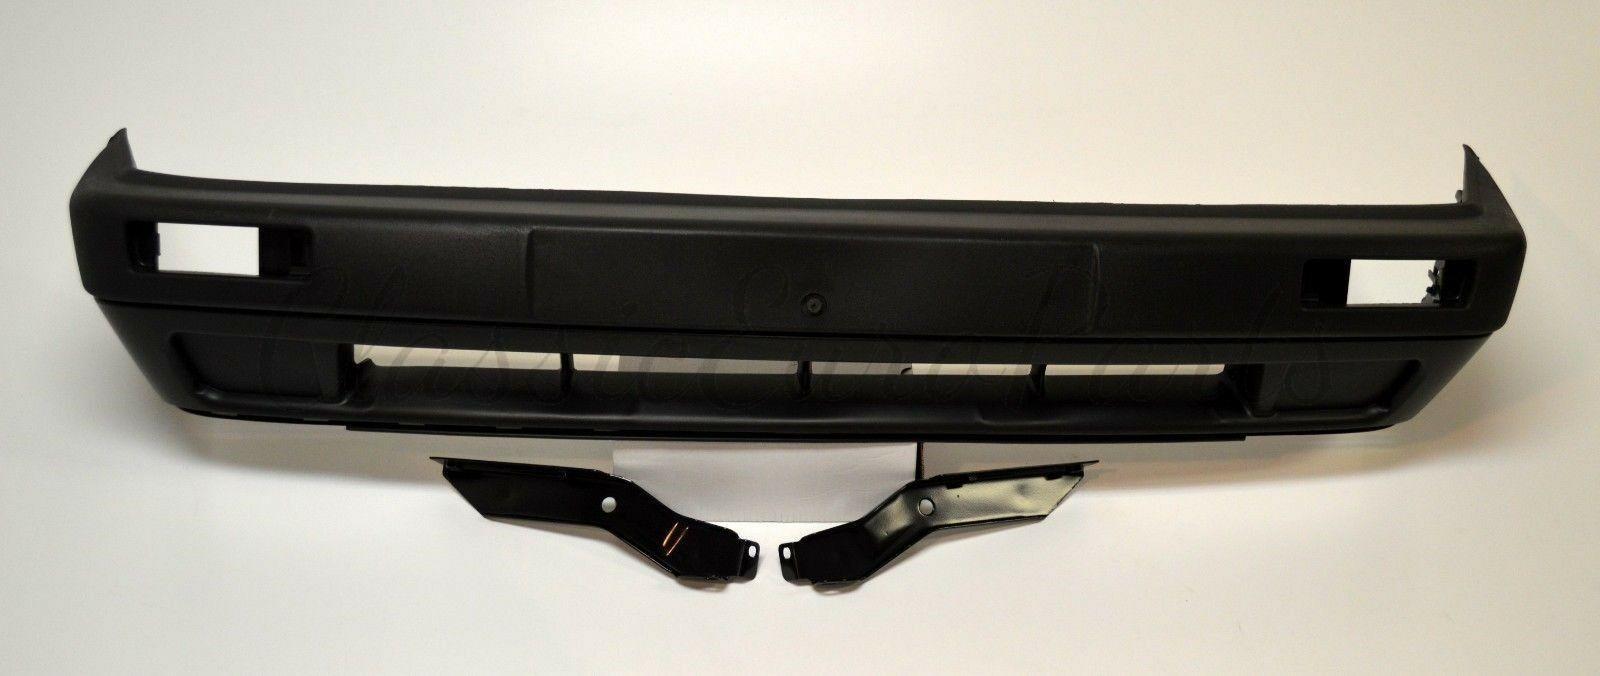 VW Golf / Rabbit / Jetta Mk2 Euro Big Bumper & 16v GTI lip set – ClassicEuroParts